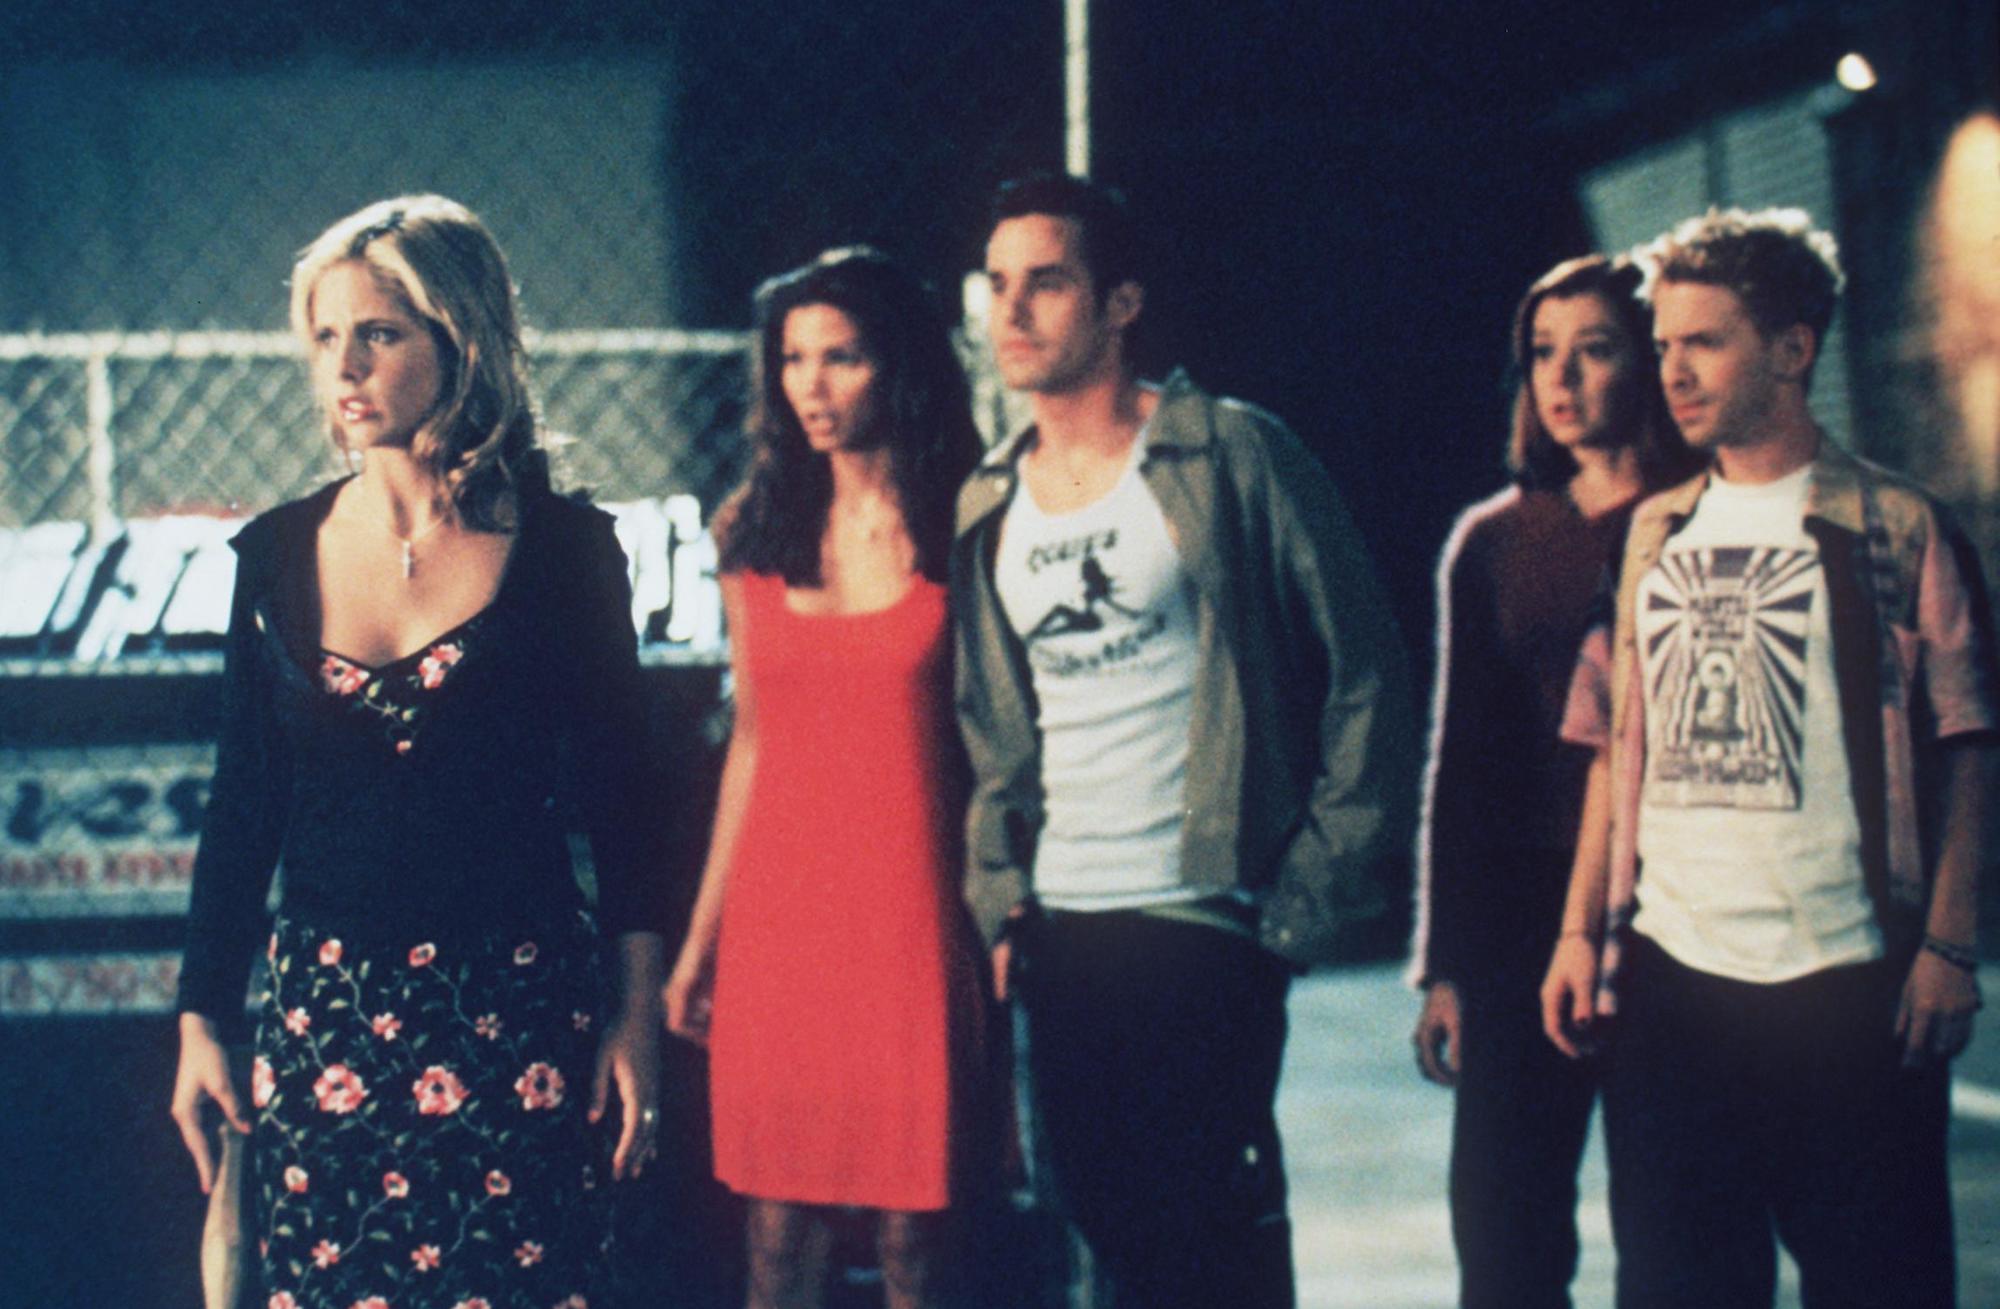 The team of 1998 'Buffy The Vampire Slayer'.